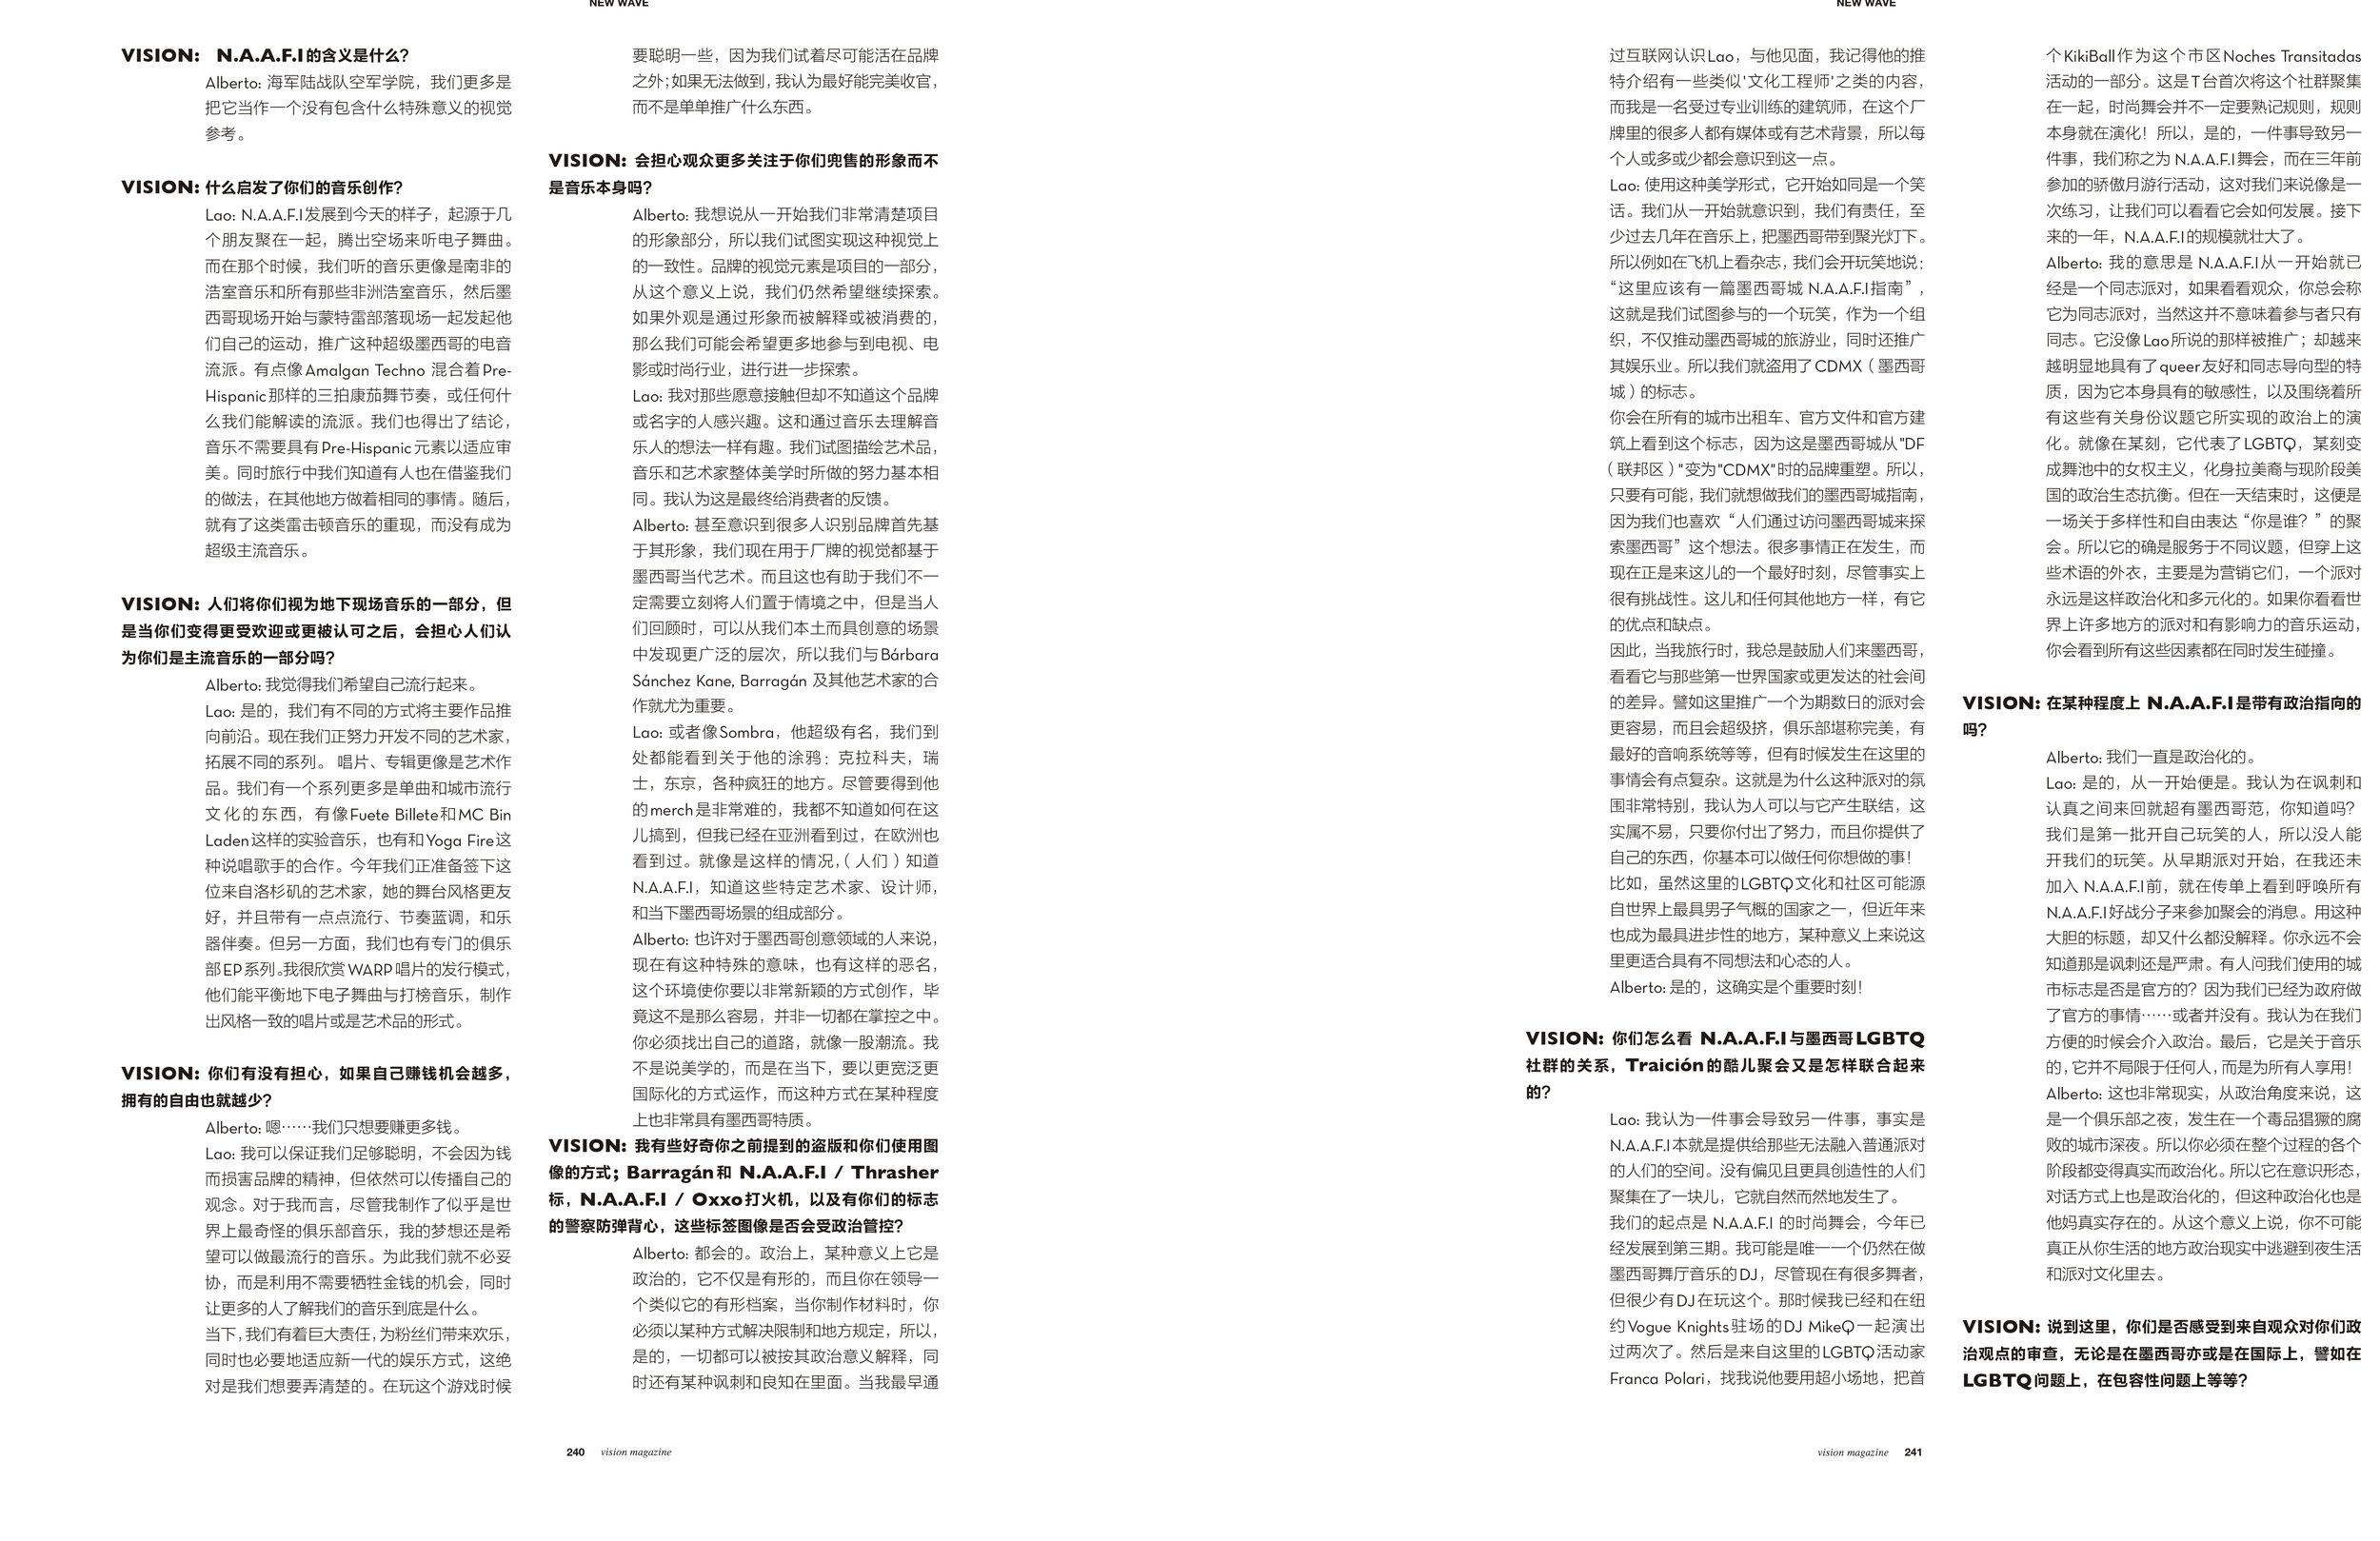 VISION-174NW EMILIO3 (arrastrado) 2.jpg